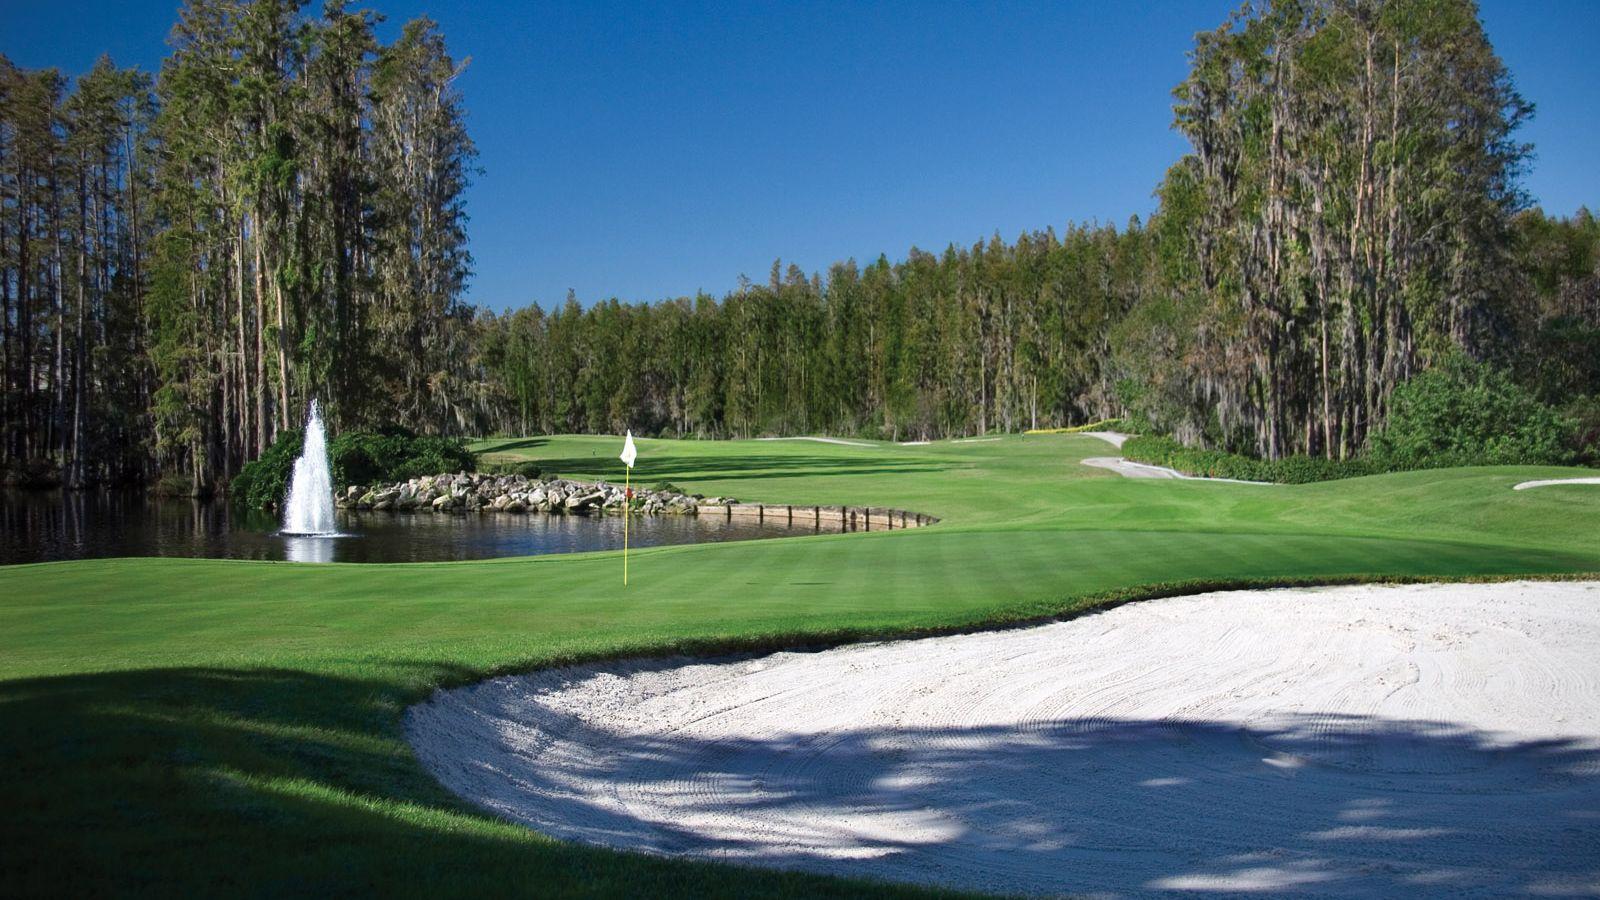 Saddlebrook Resort - 36 holes of golf on site